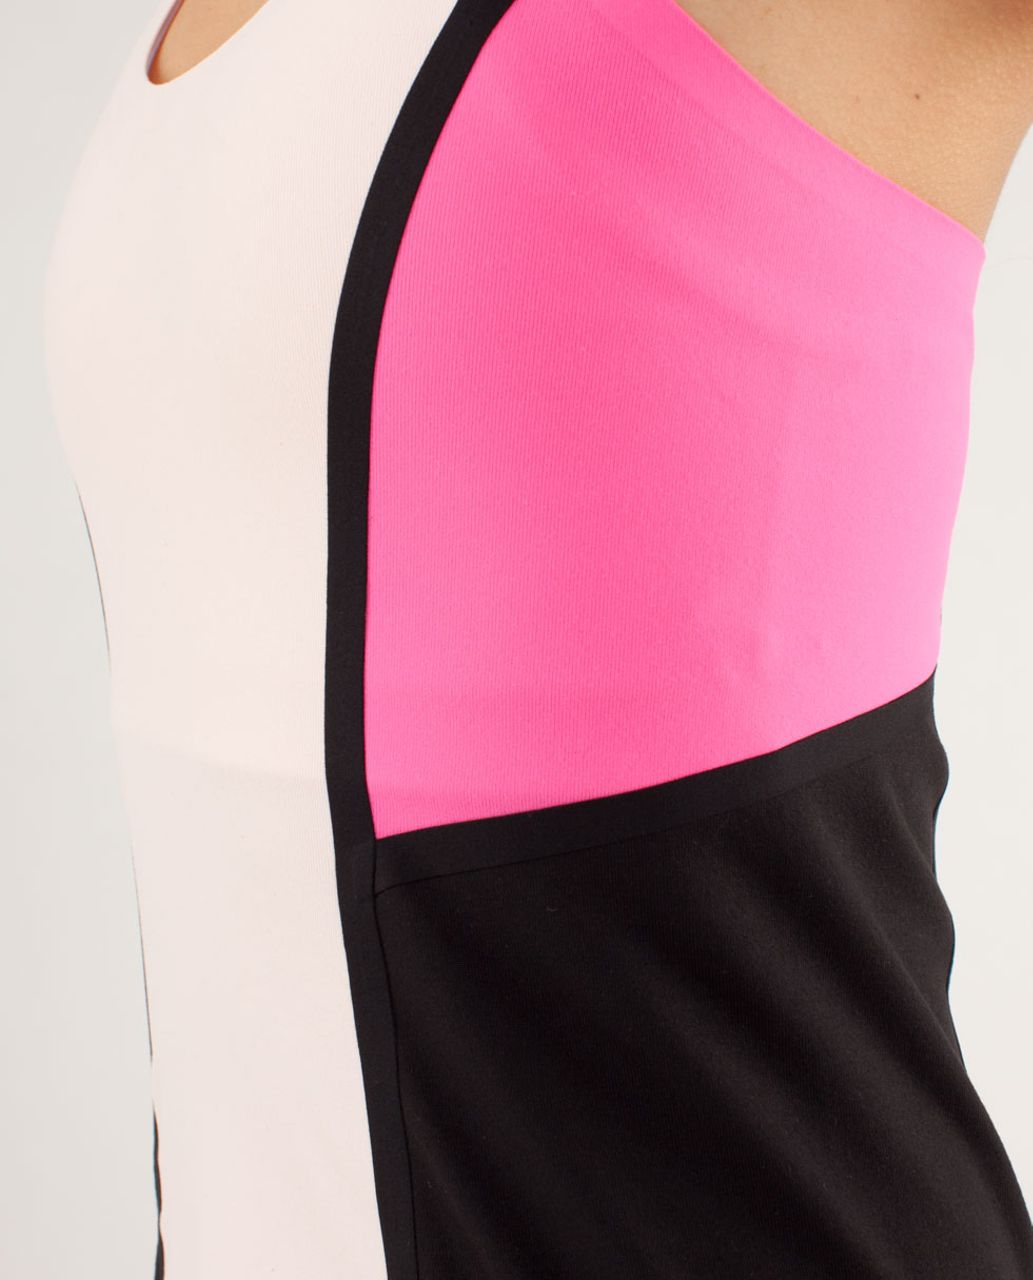 Lululemon Cool Racerback *Surf Bonded - Parfait Pink / Pinkelicious / Black